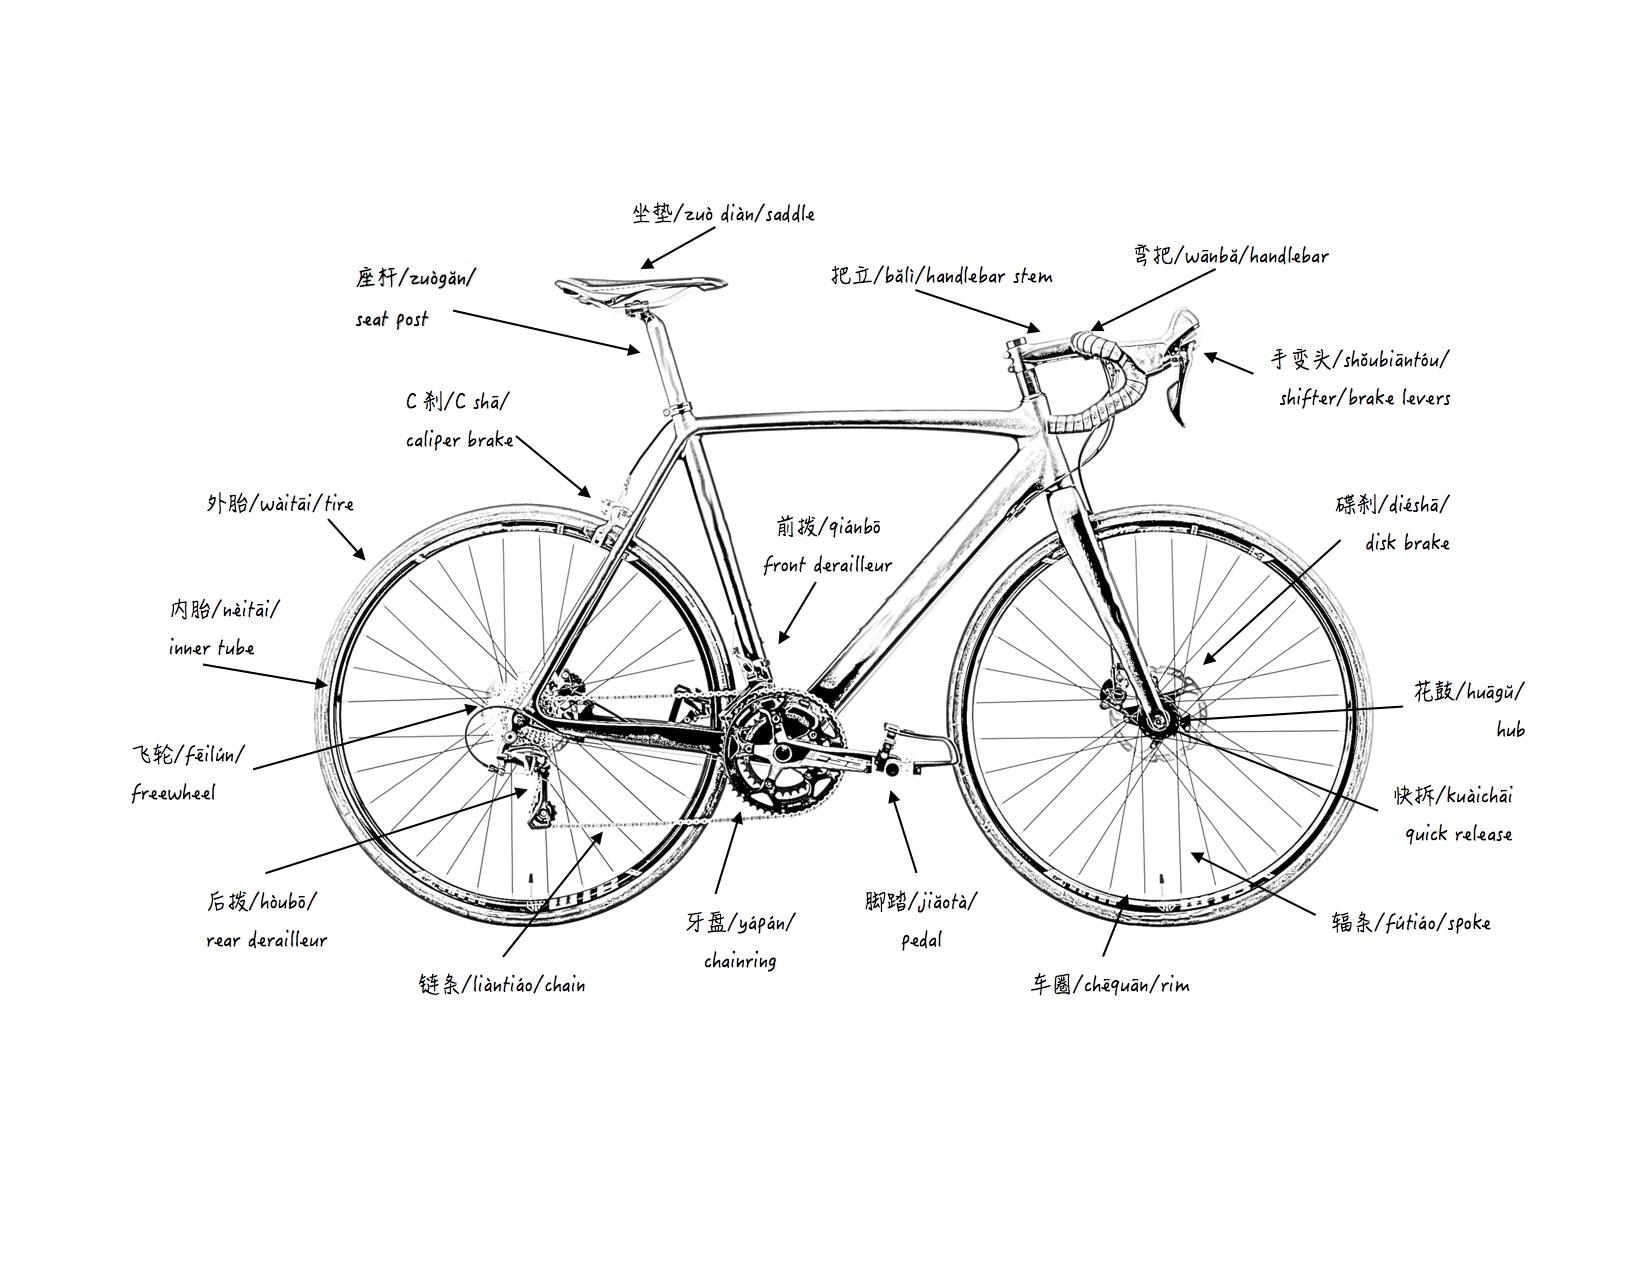 bicycle wiring diagram 2007 softail bike parts 18 images